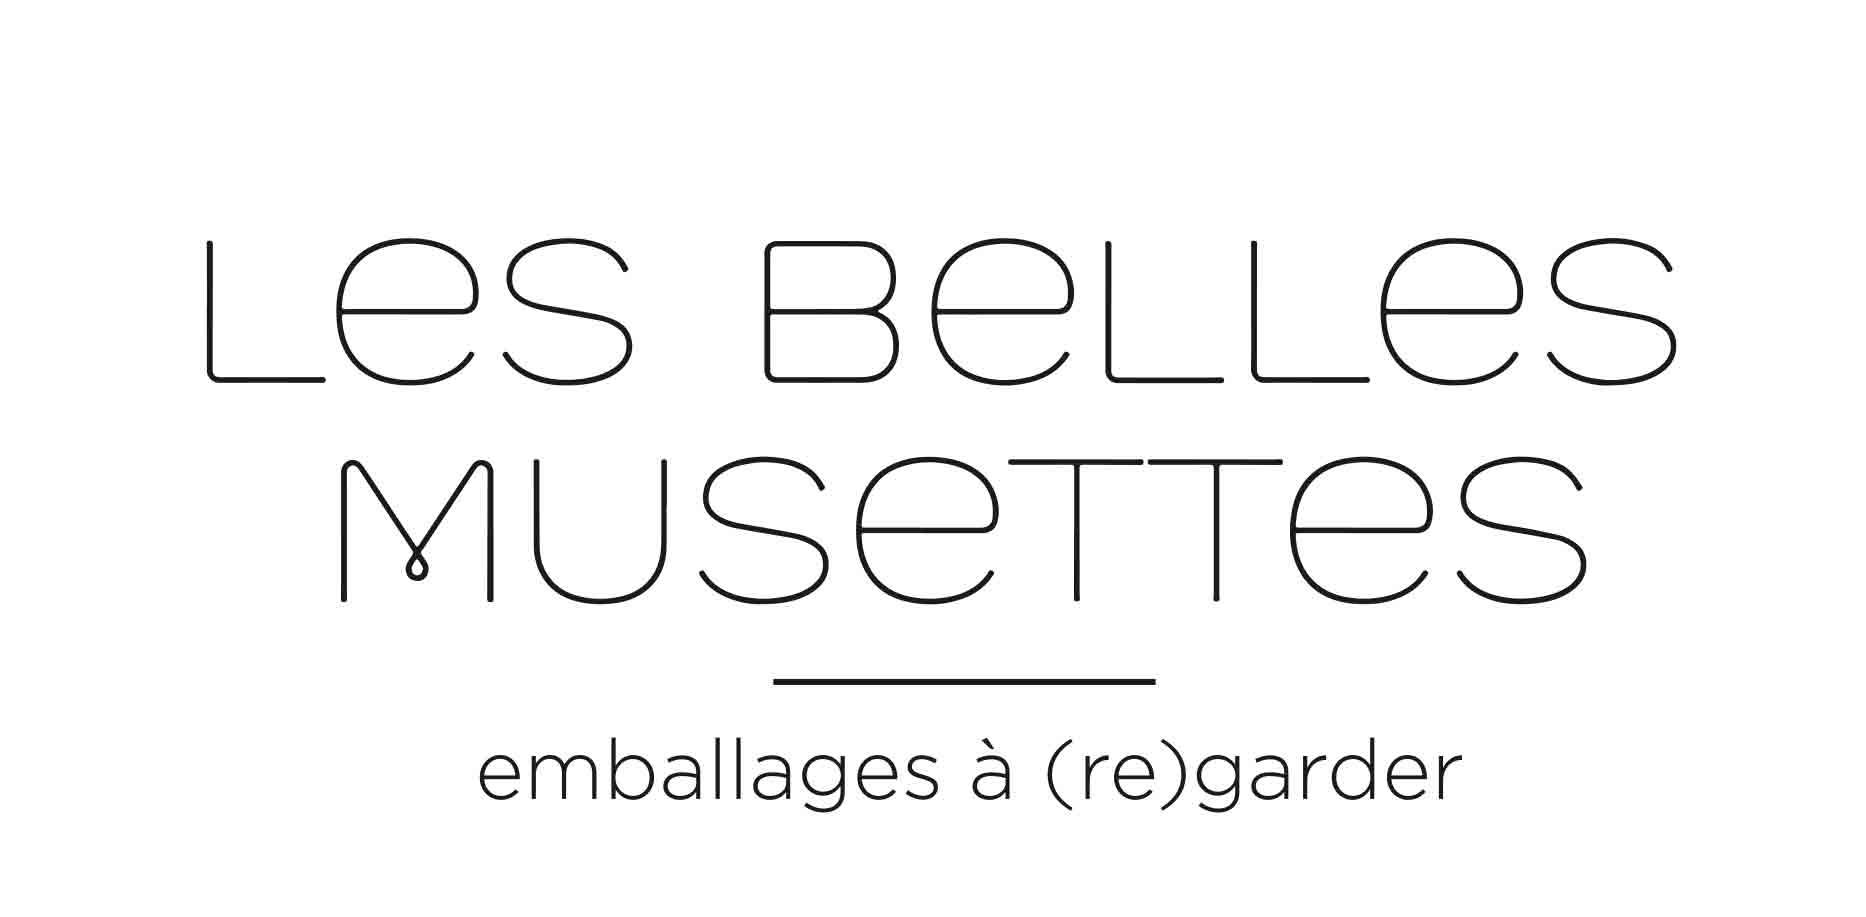 Les belles musettes - Logo Made in France